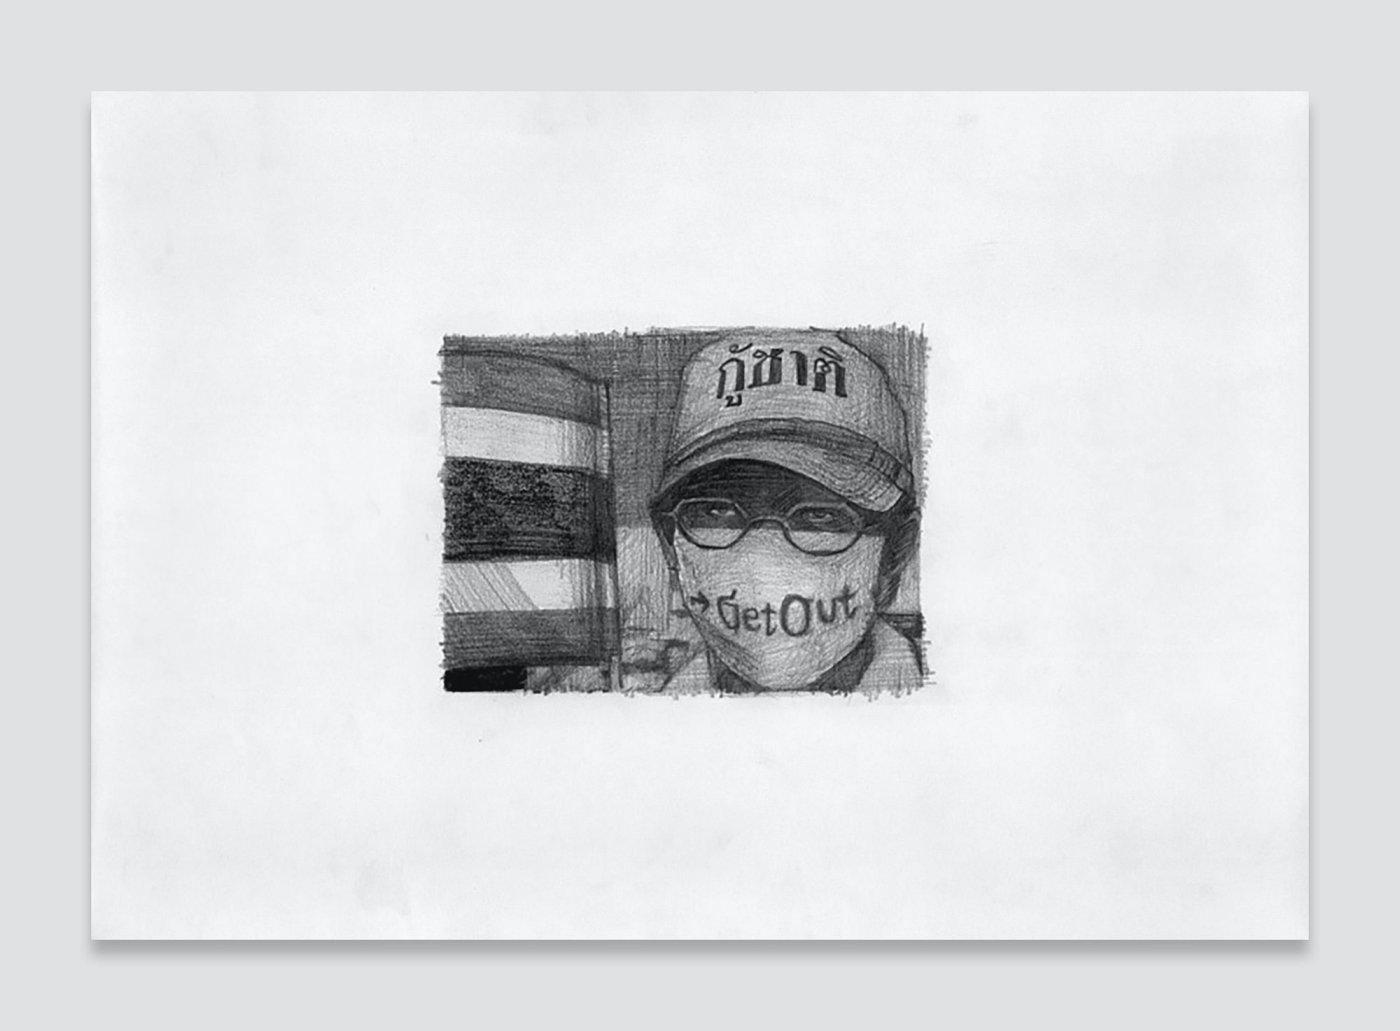 Untitled (Demonstration No. 194)